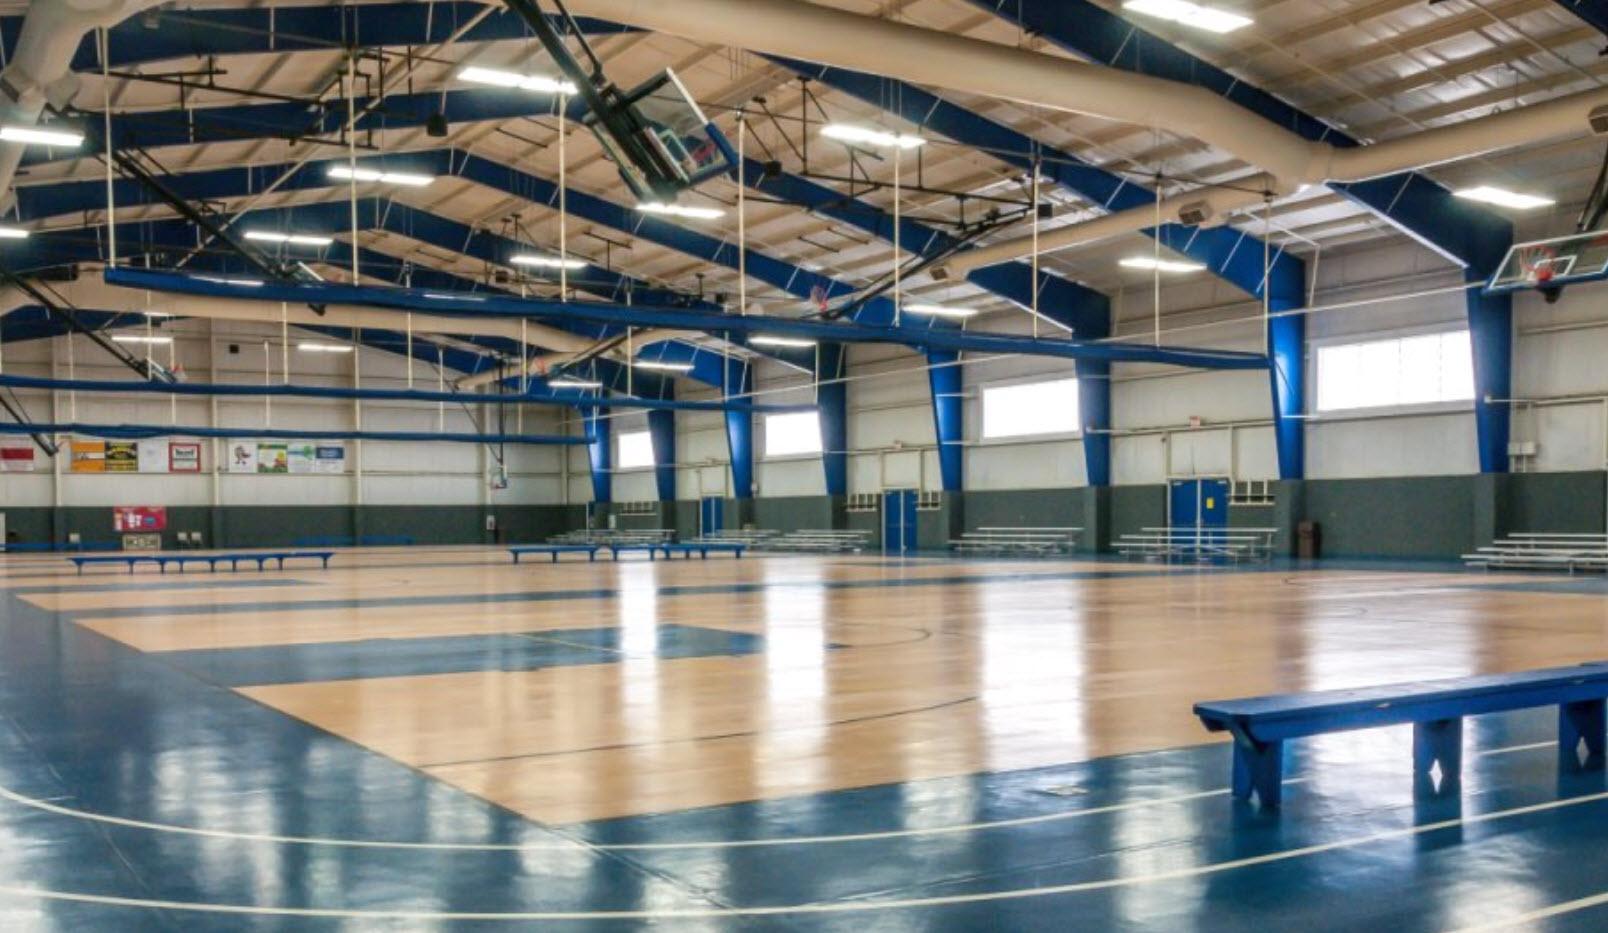 Gymnastics Courts